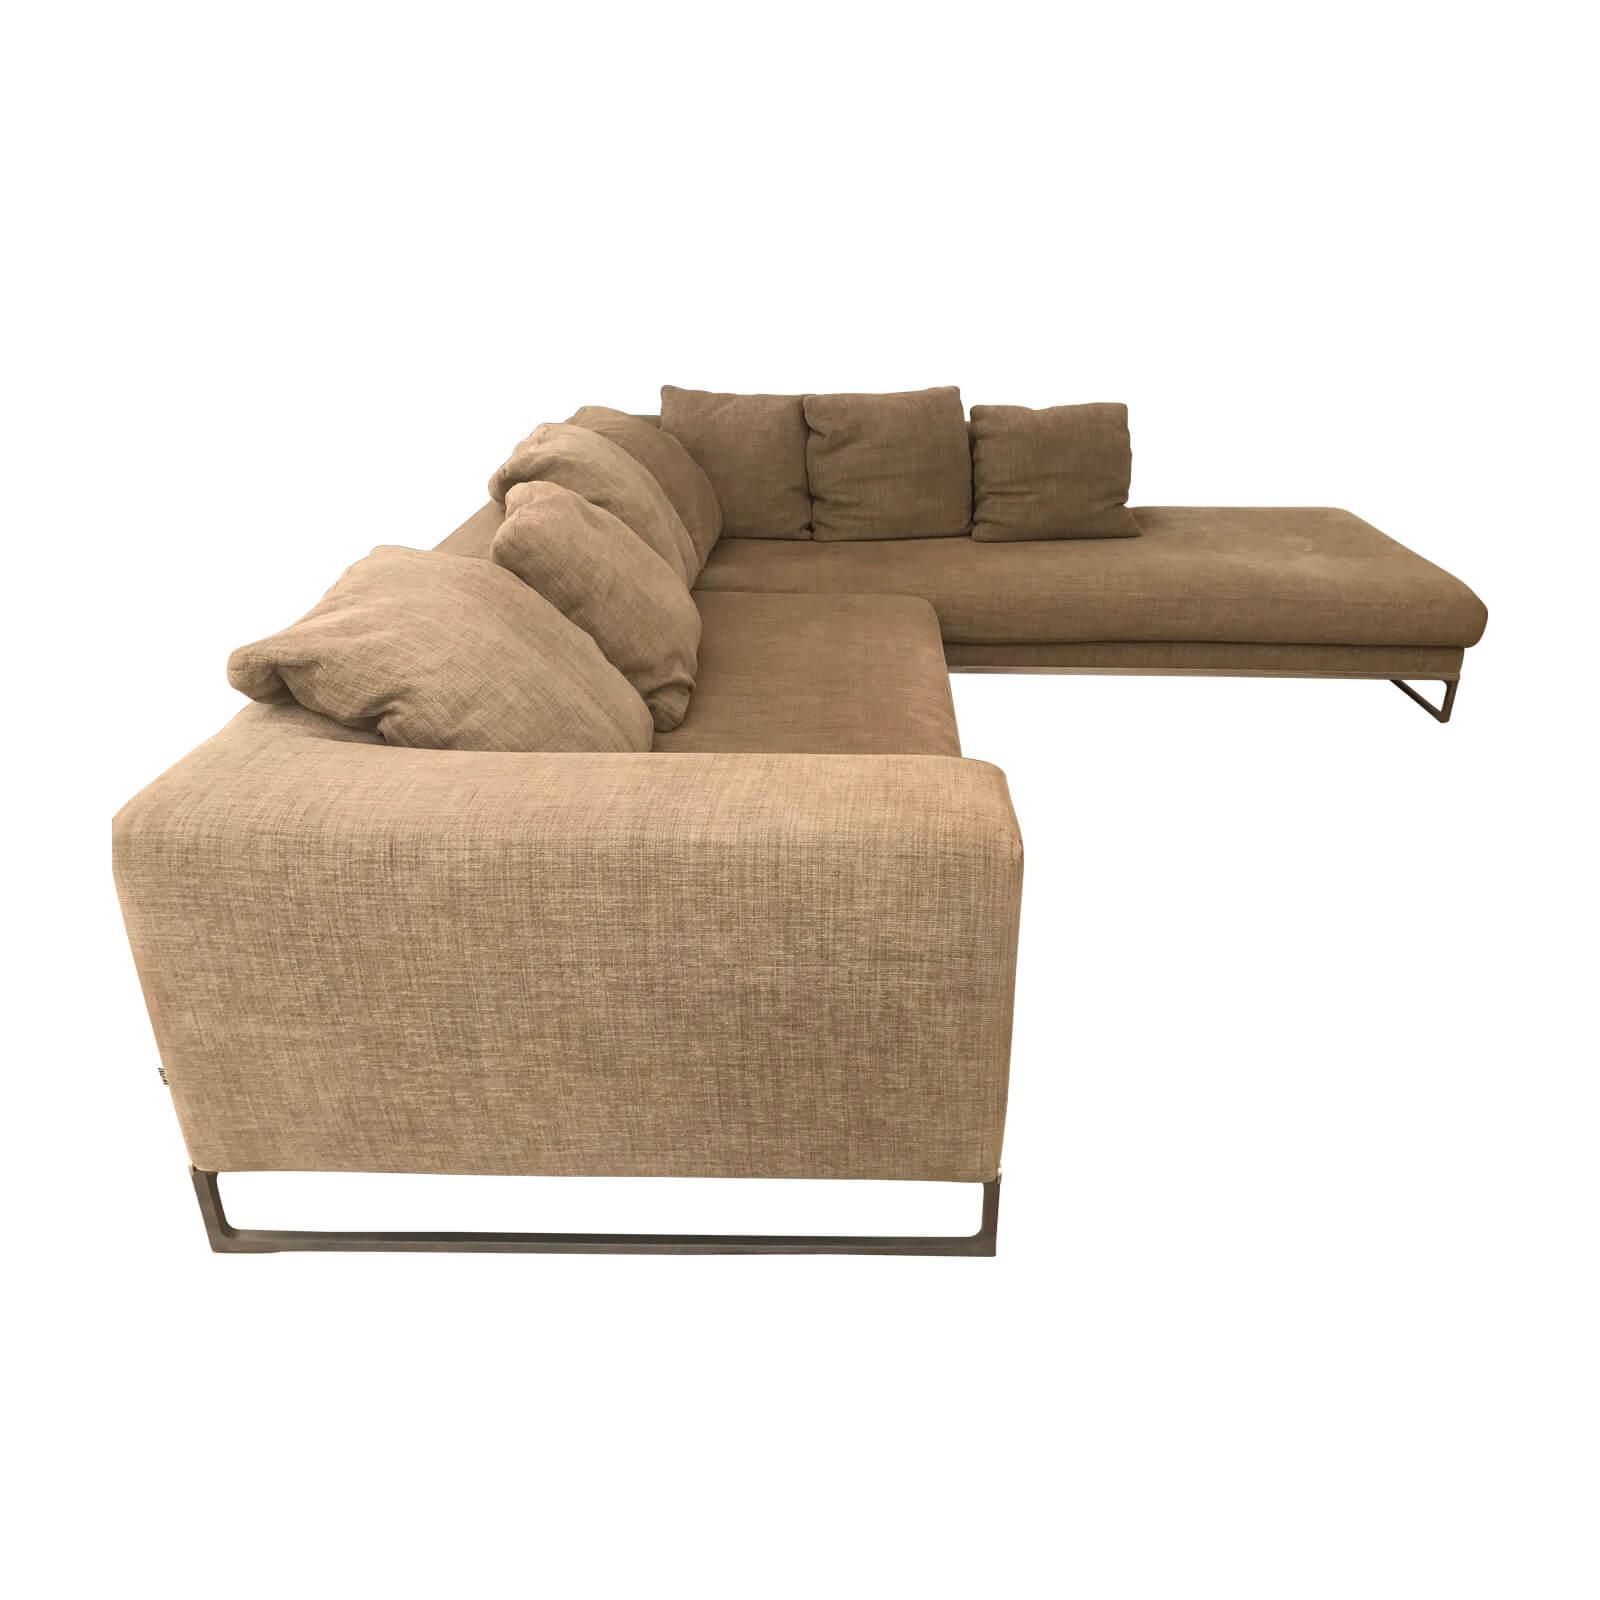 Two Design Lovers B&B Italia Dadone sofa 1